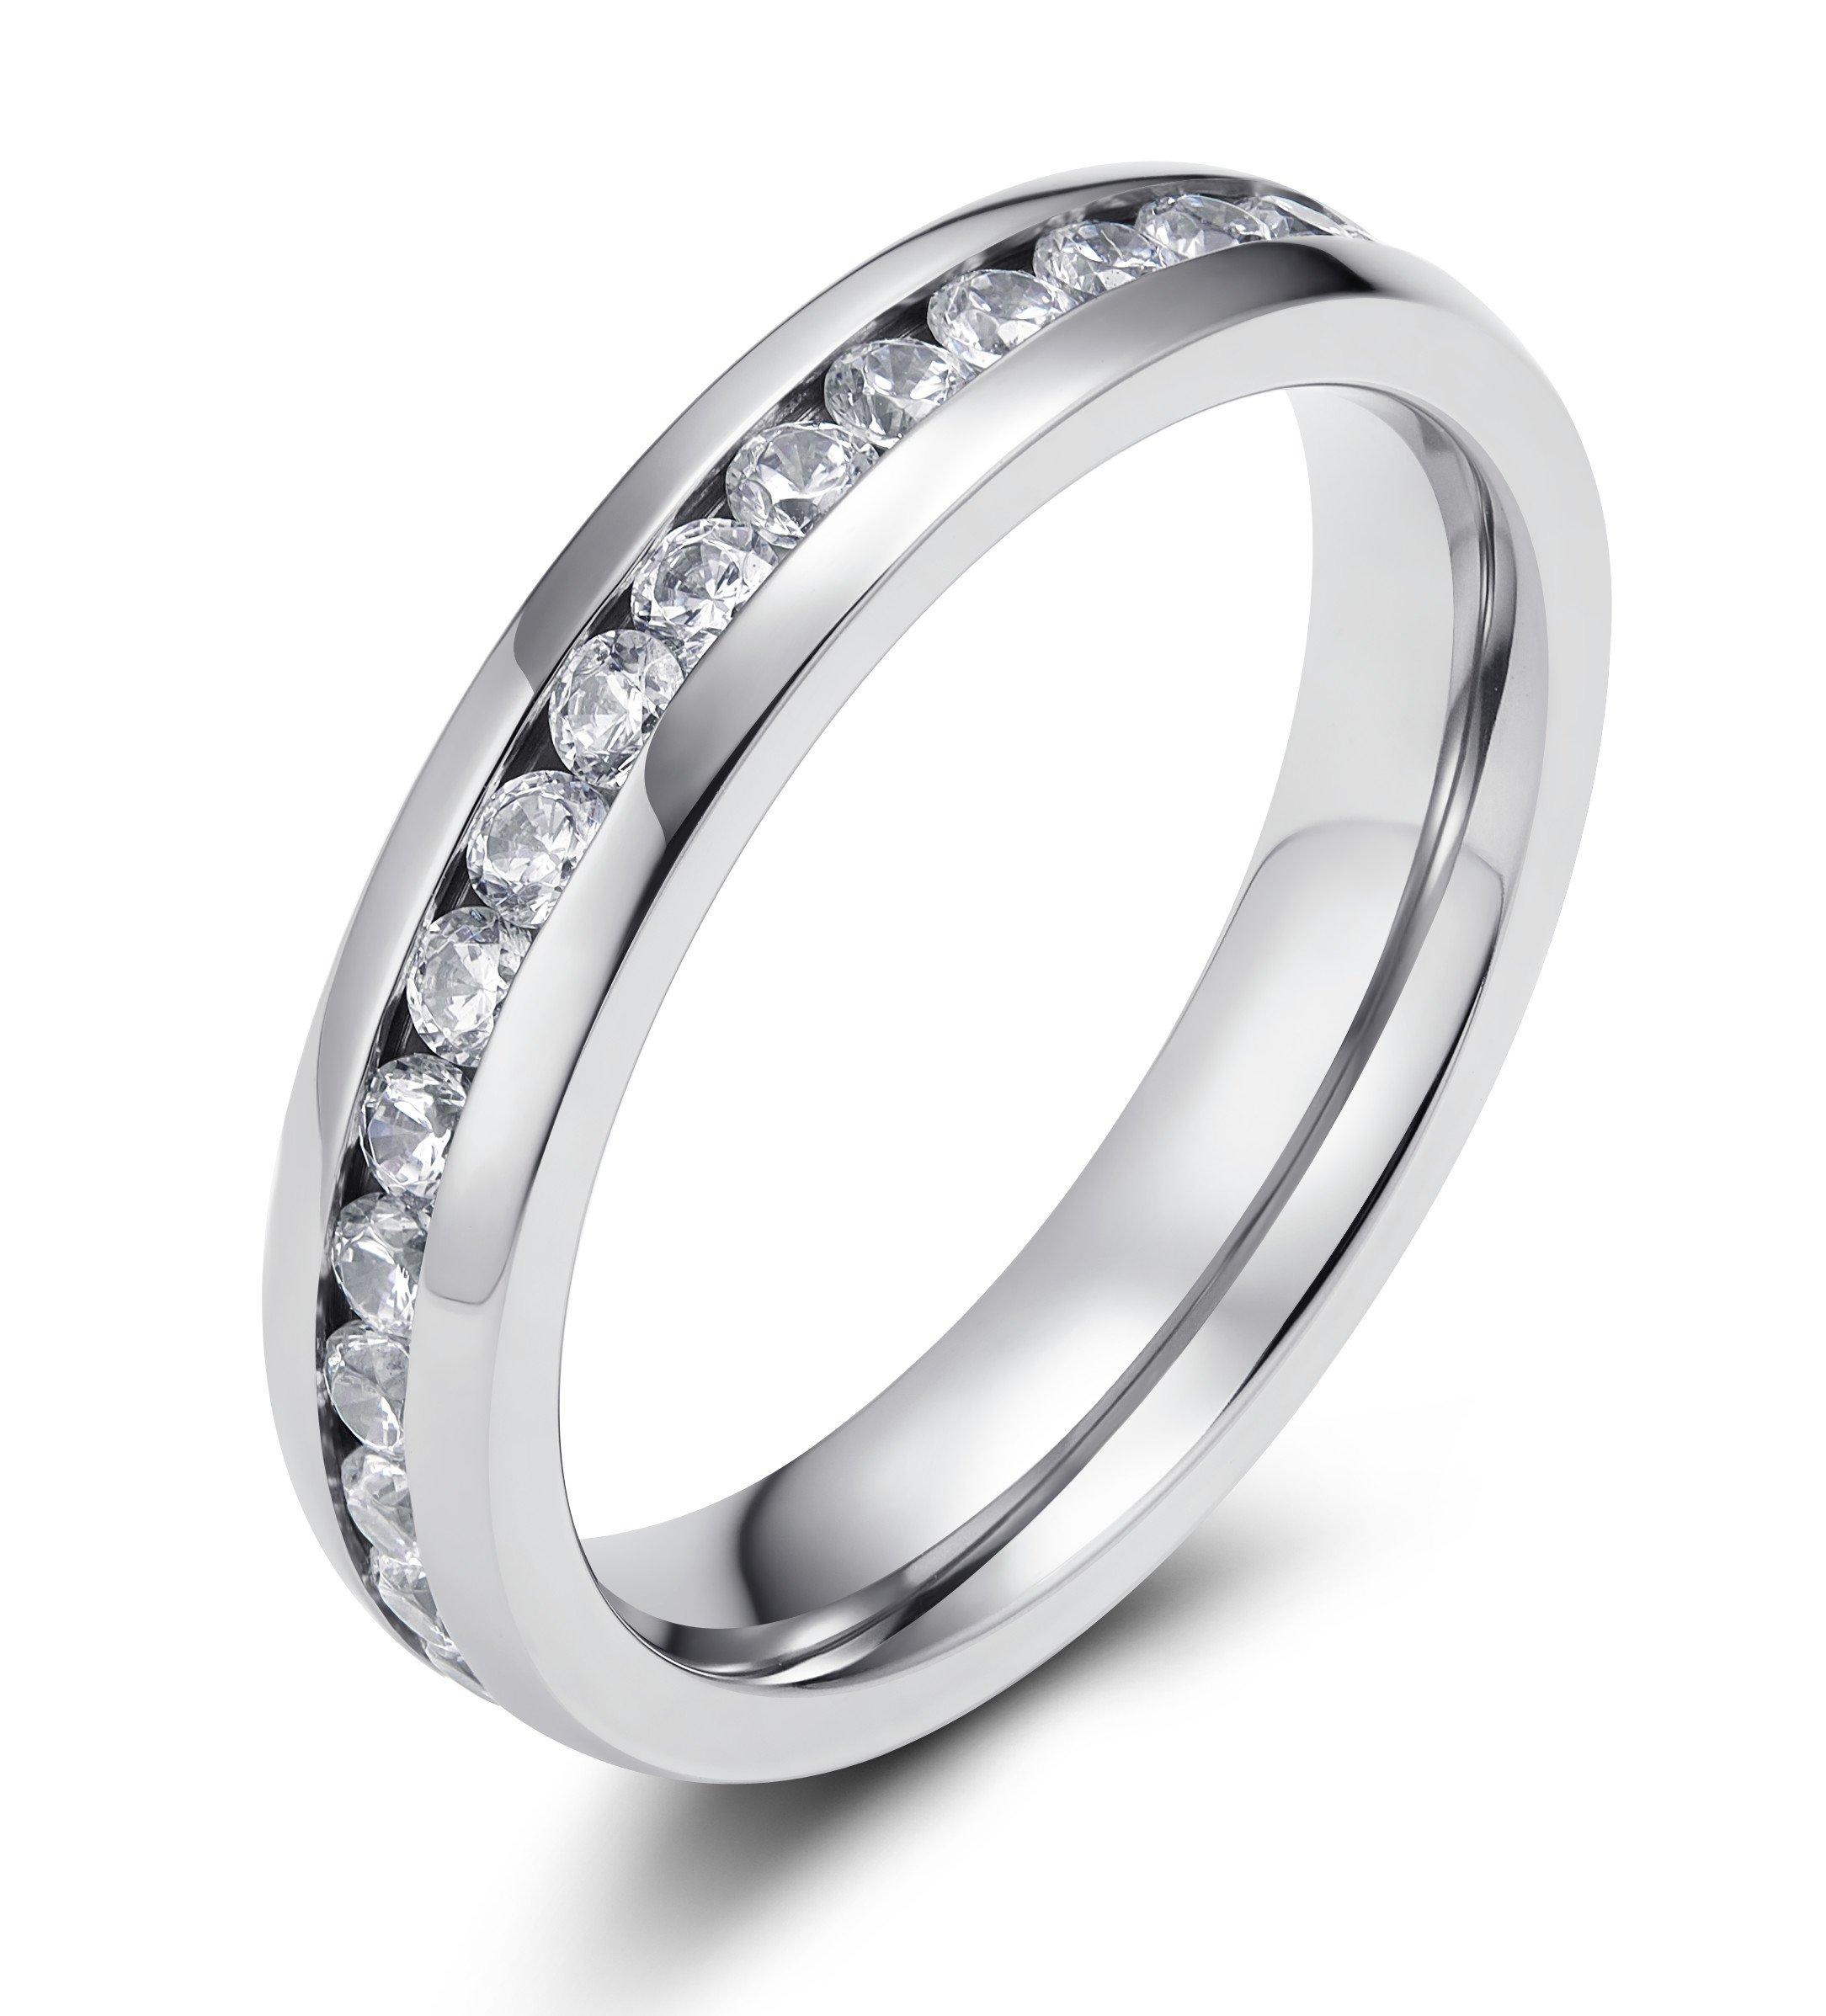 TIGRADE 4MM Eternity Titanium Ring Wedding Band with Cubic Zirconia (6)